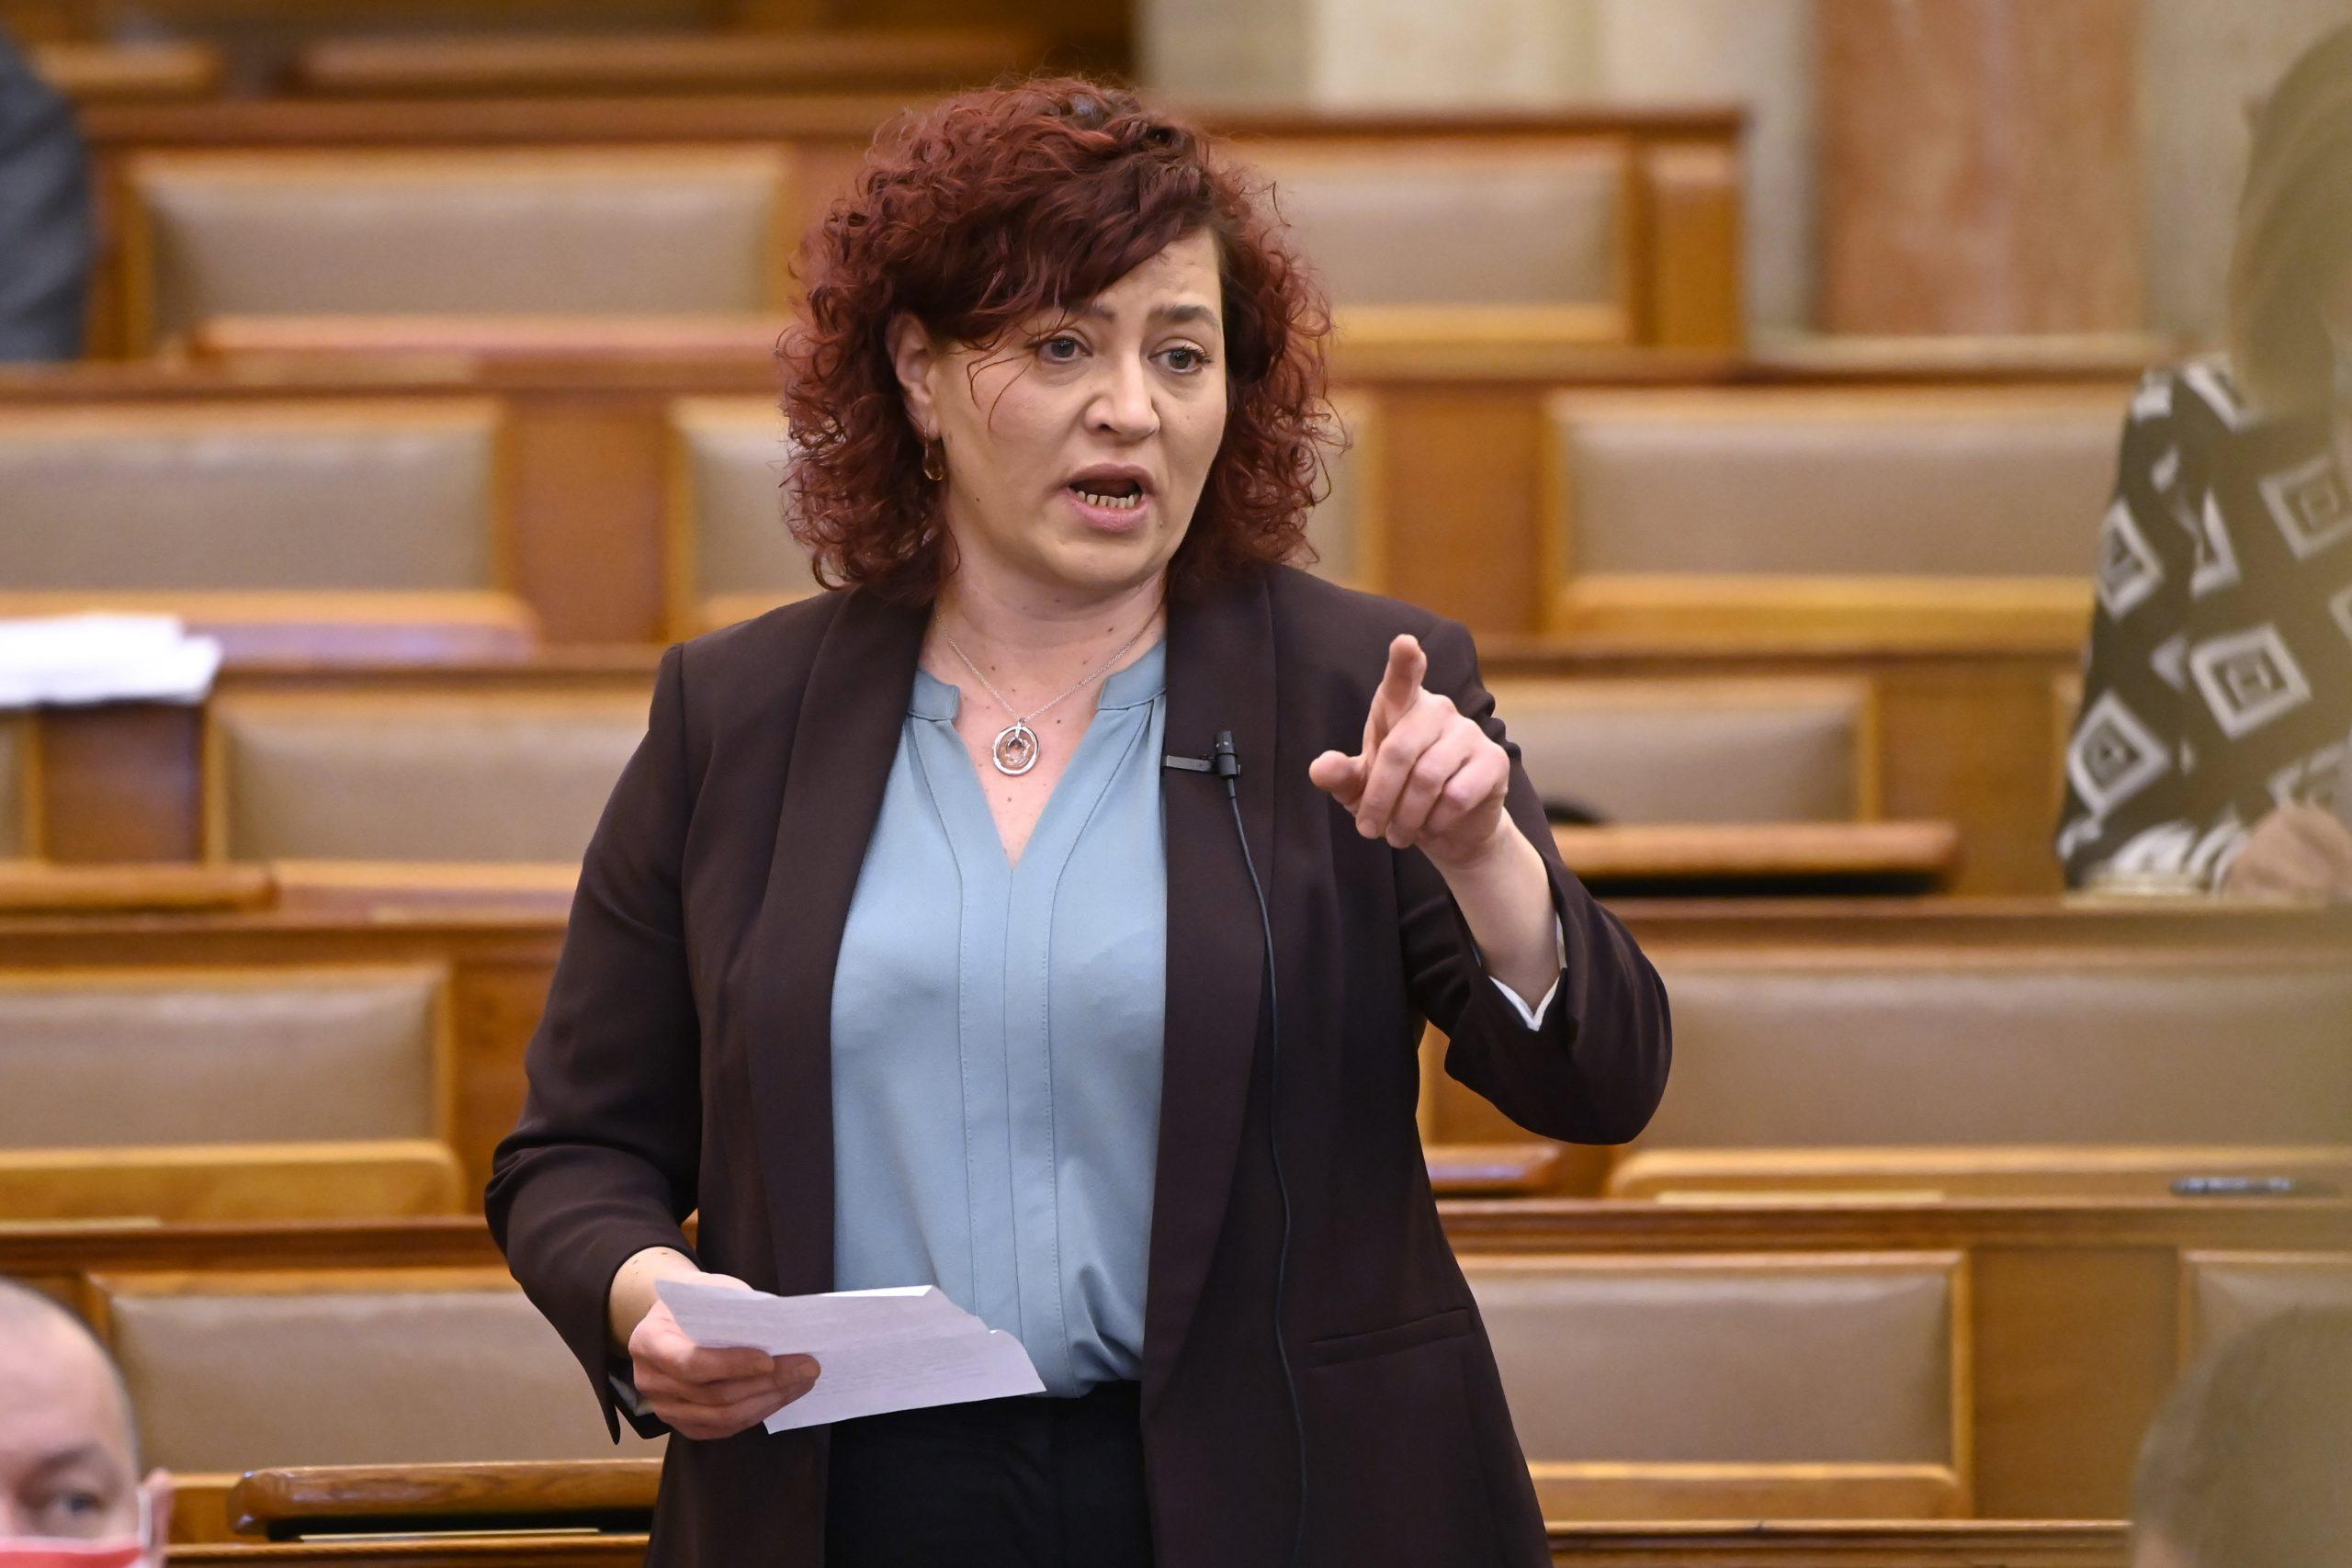 Pegasus-Skandal: Oppositionsparteien fordern Transparenz